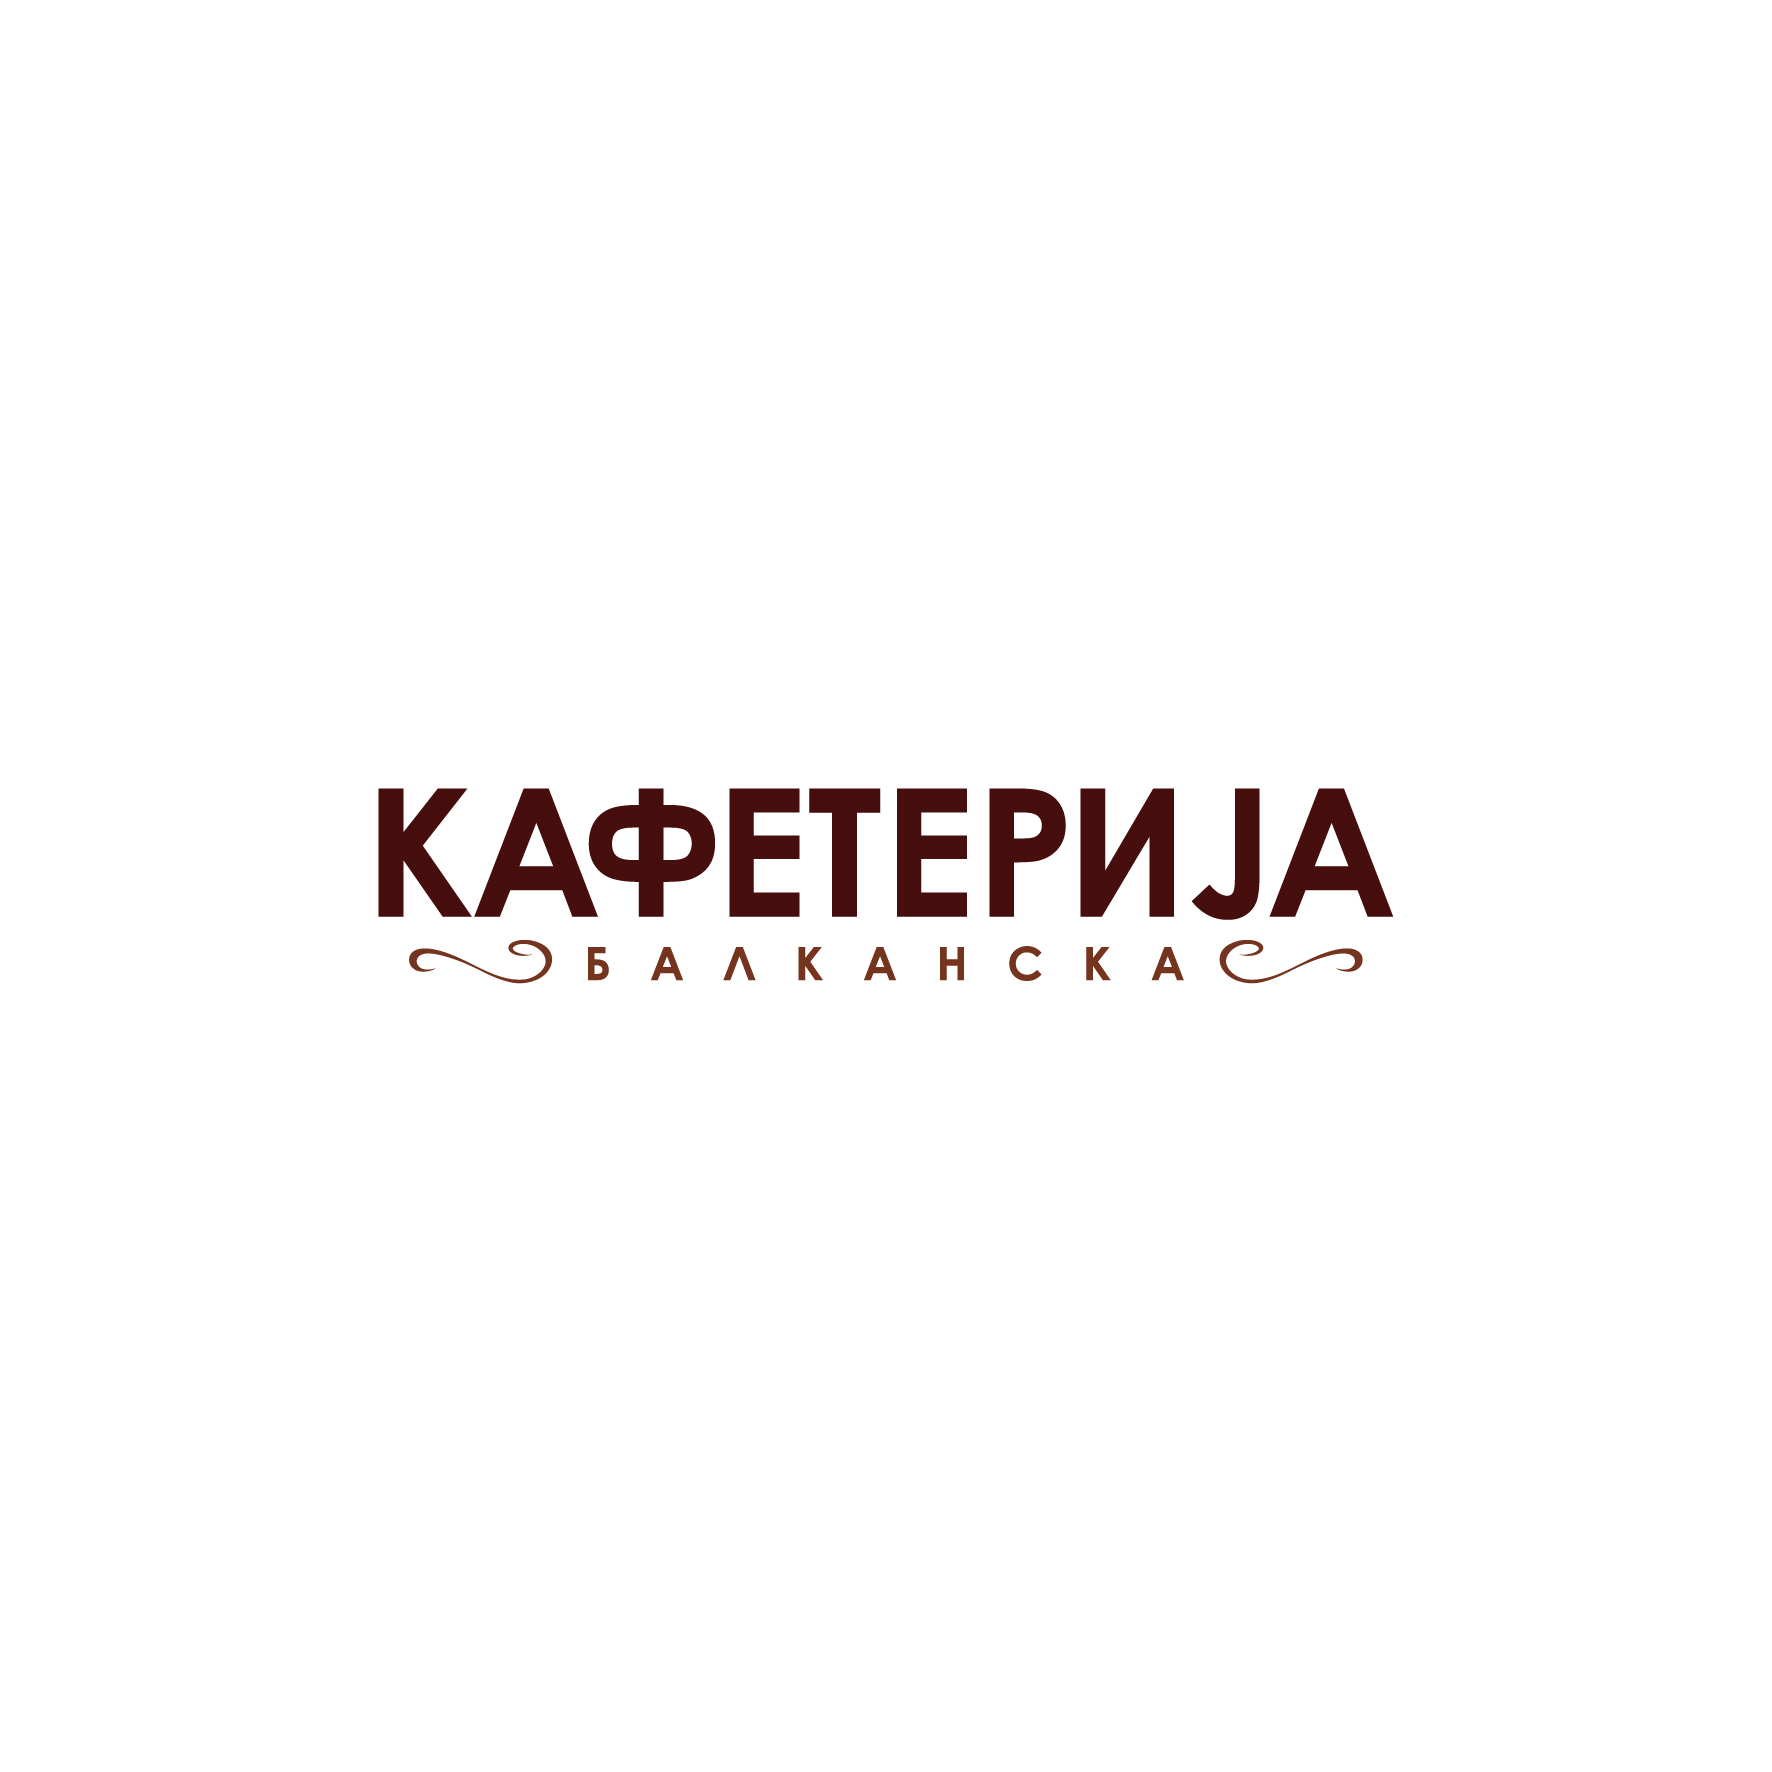 Kafeterija Balkanska doo